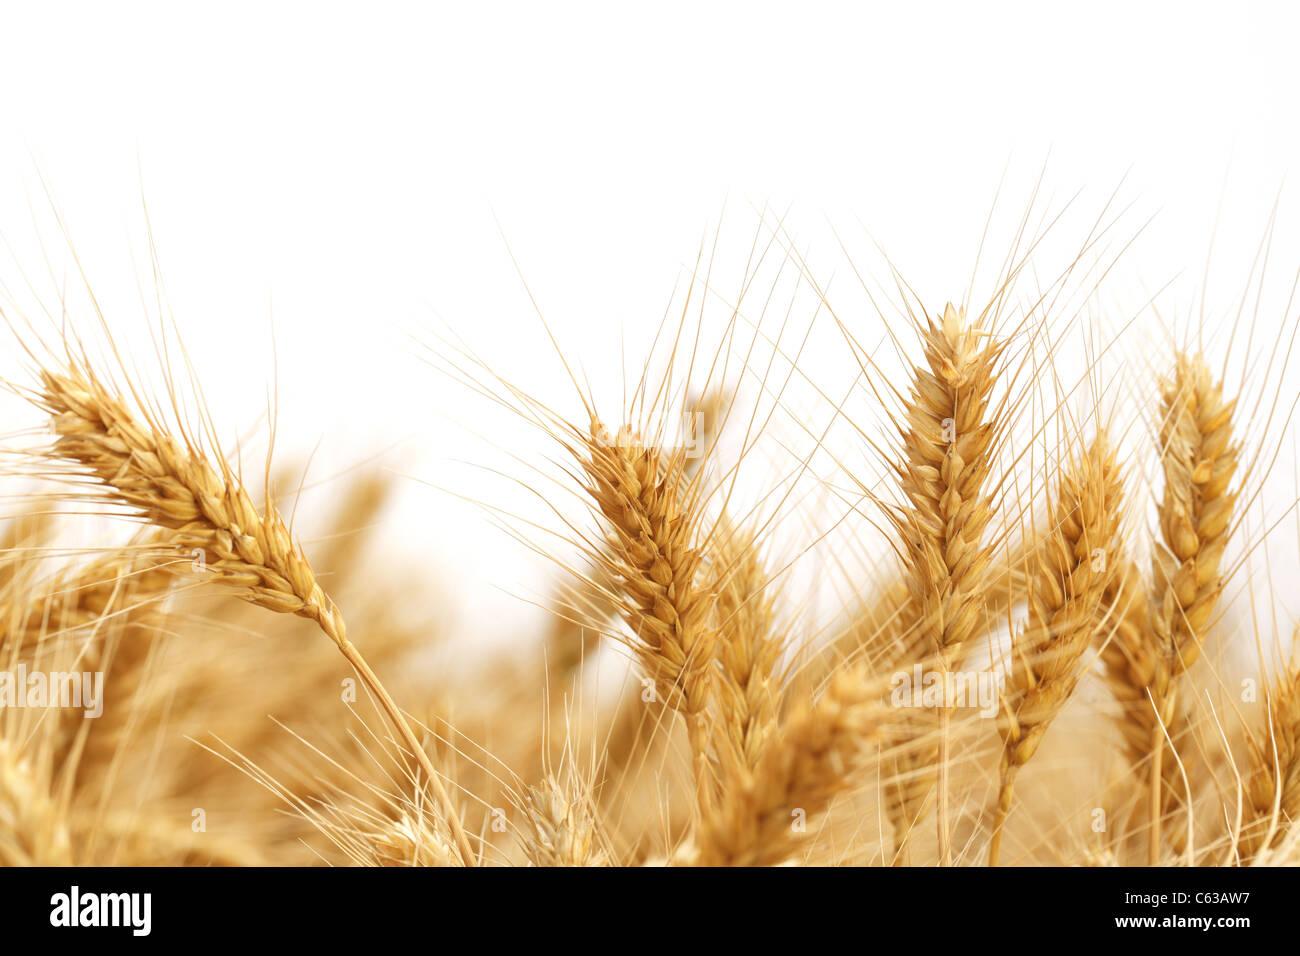 Espigas de trigo aislado en blanco. Imagen De Stock